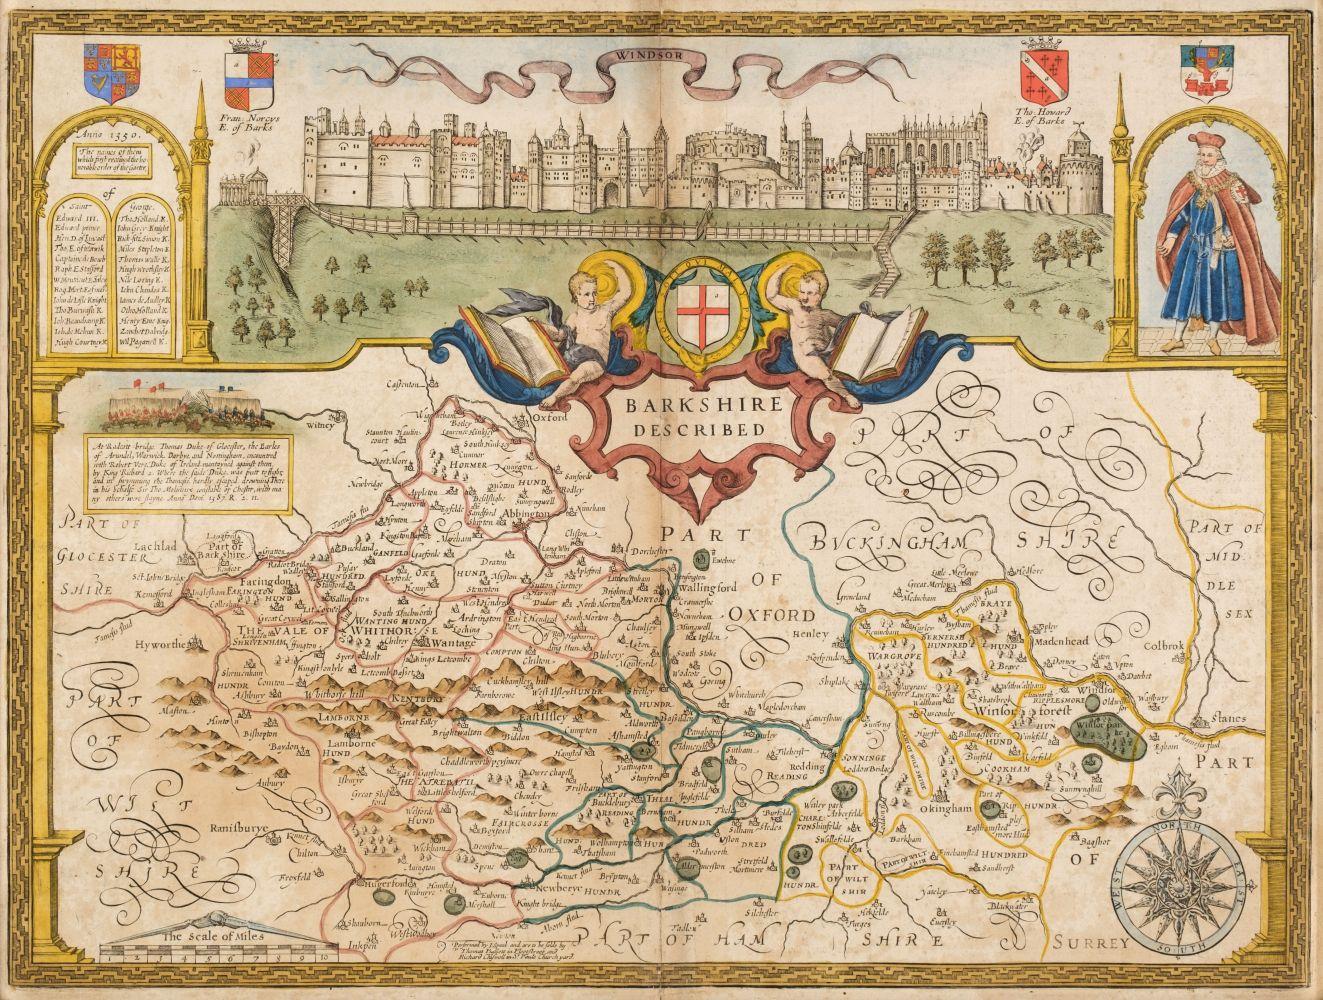 * Berkshire. Speed (John), Barkshire Described, Thomas Bassett & Richard Chiswell, 1676